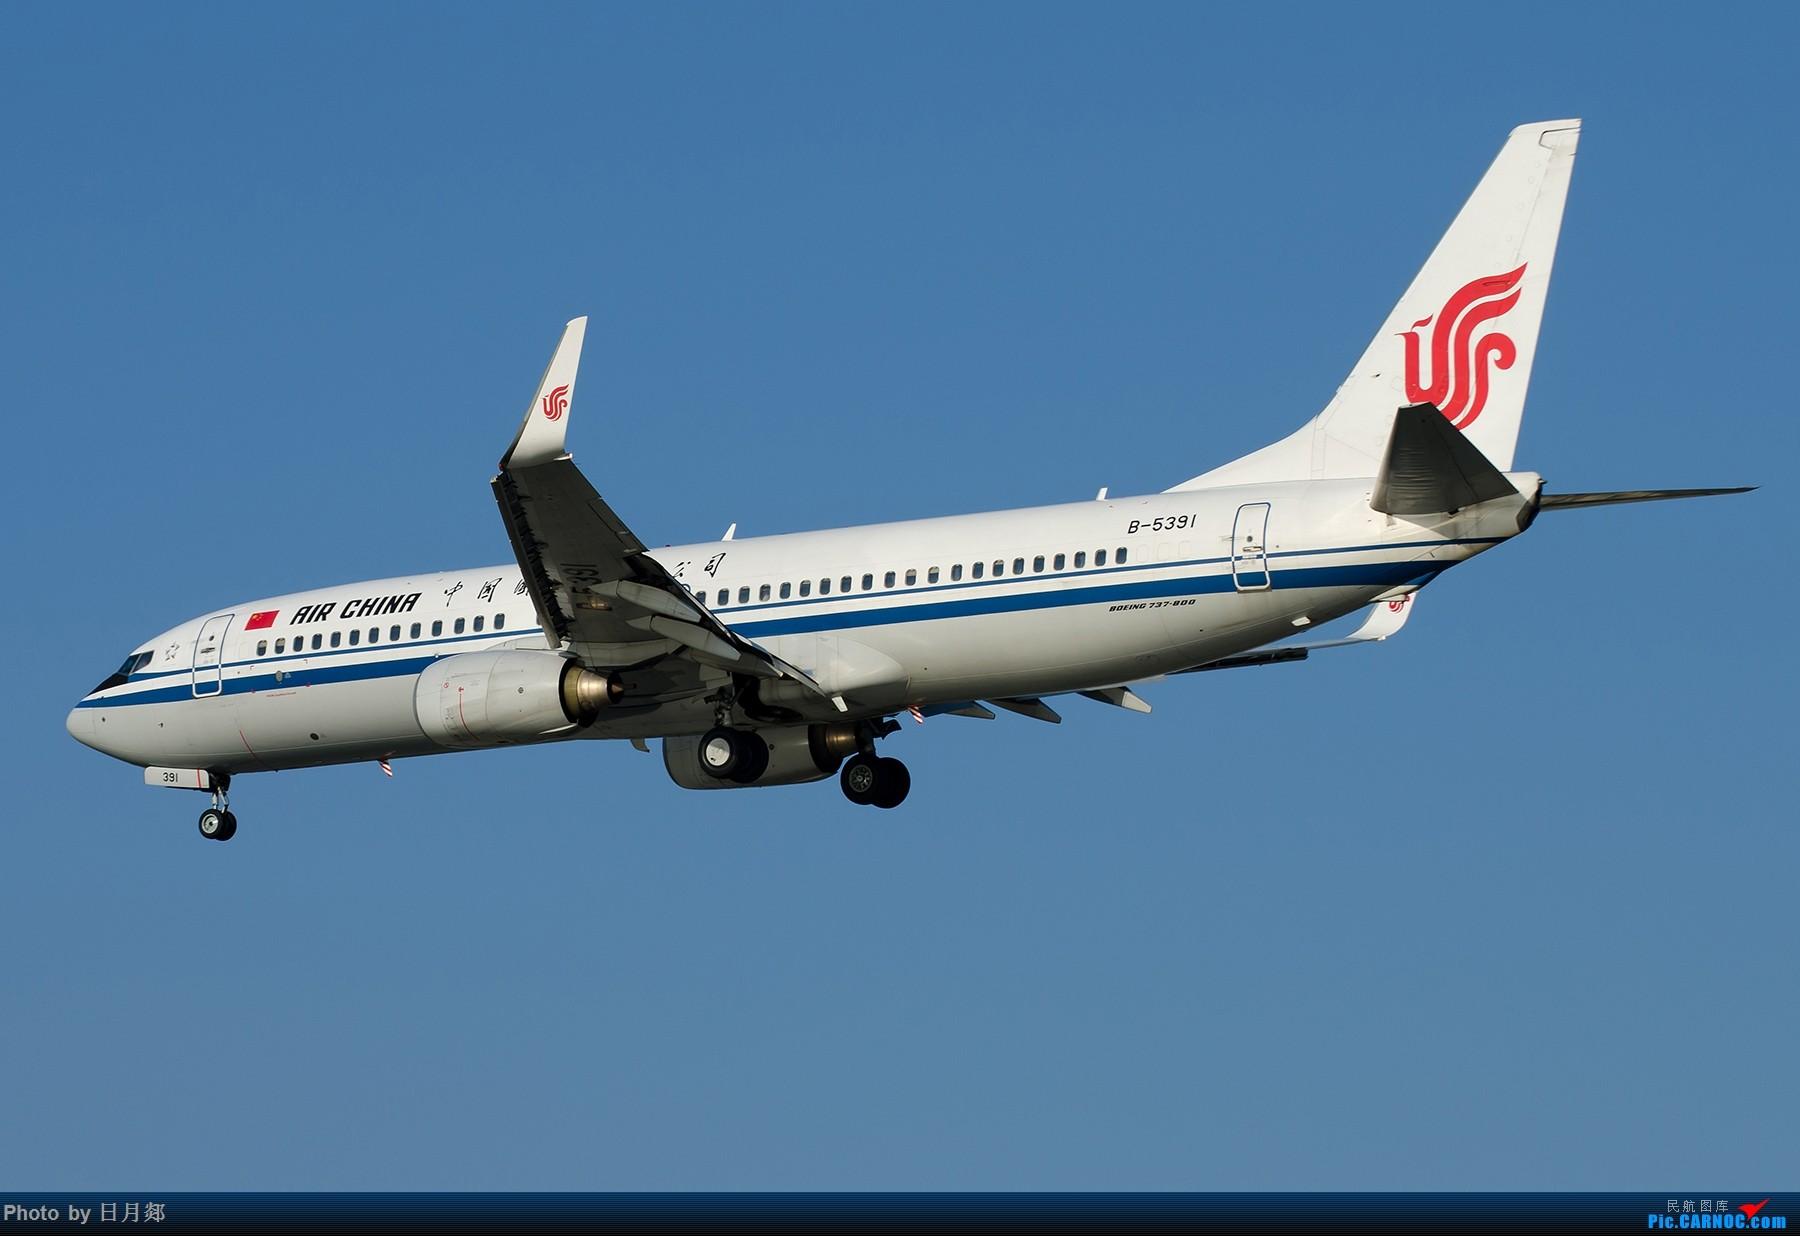 Re:[原创]【SHA拍机*1800大图】轻度污染来临前宝贵的蓝天,且拍且珍惜 BOEING 737-800 B-5391 中国上海虹桥国际机场